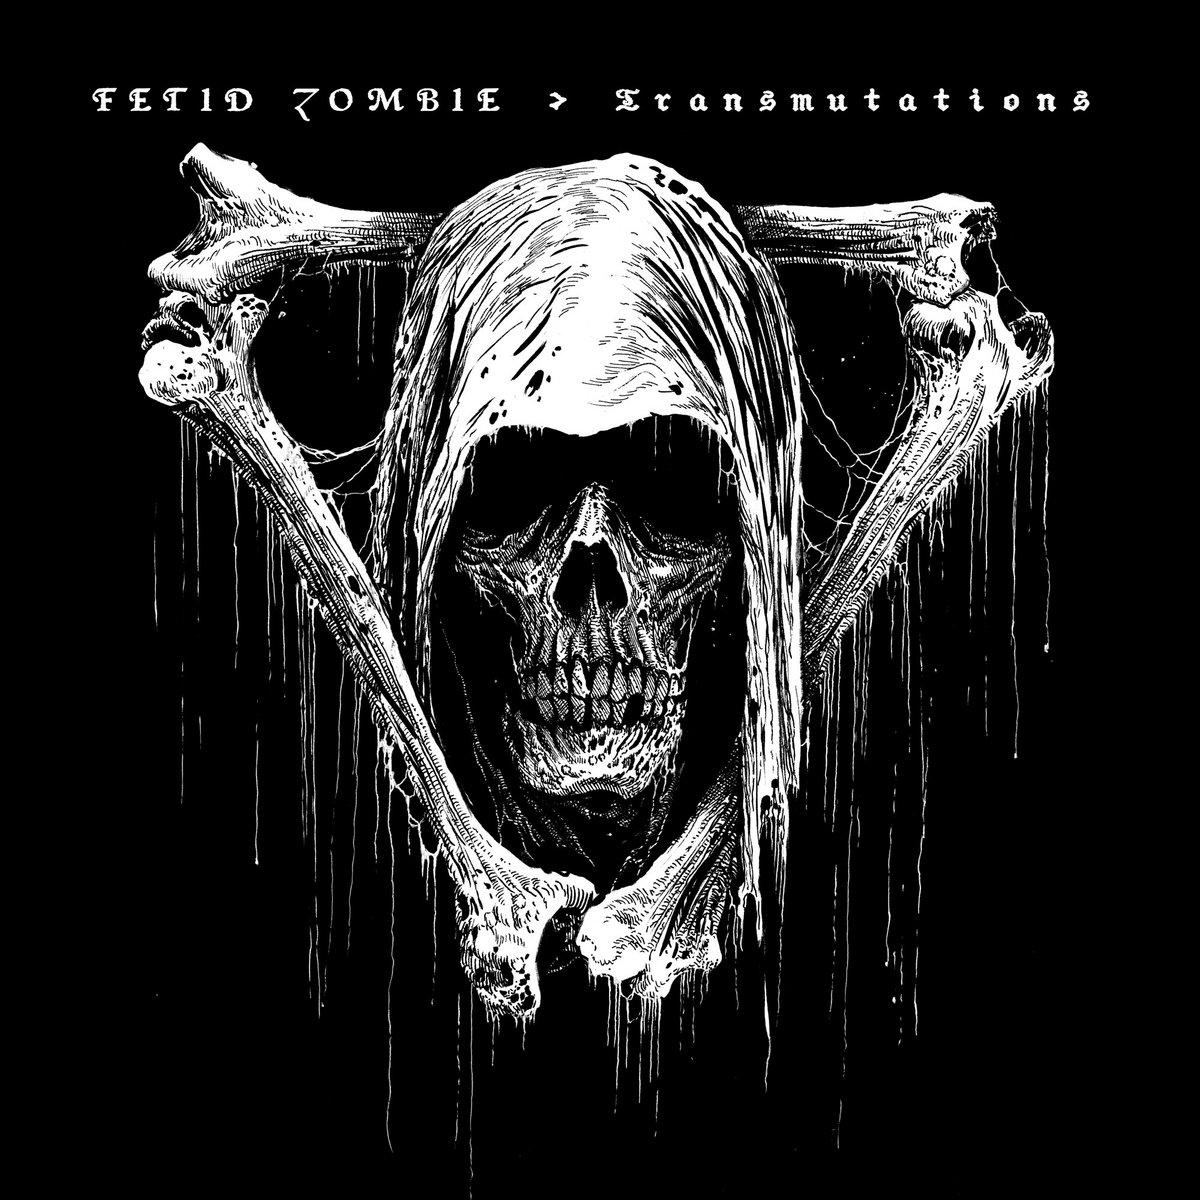 fetid zombie Transmutations